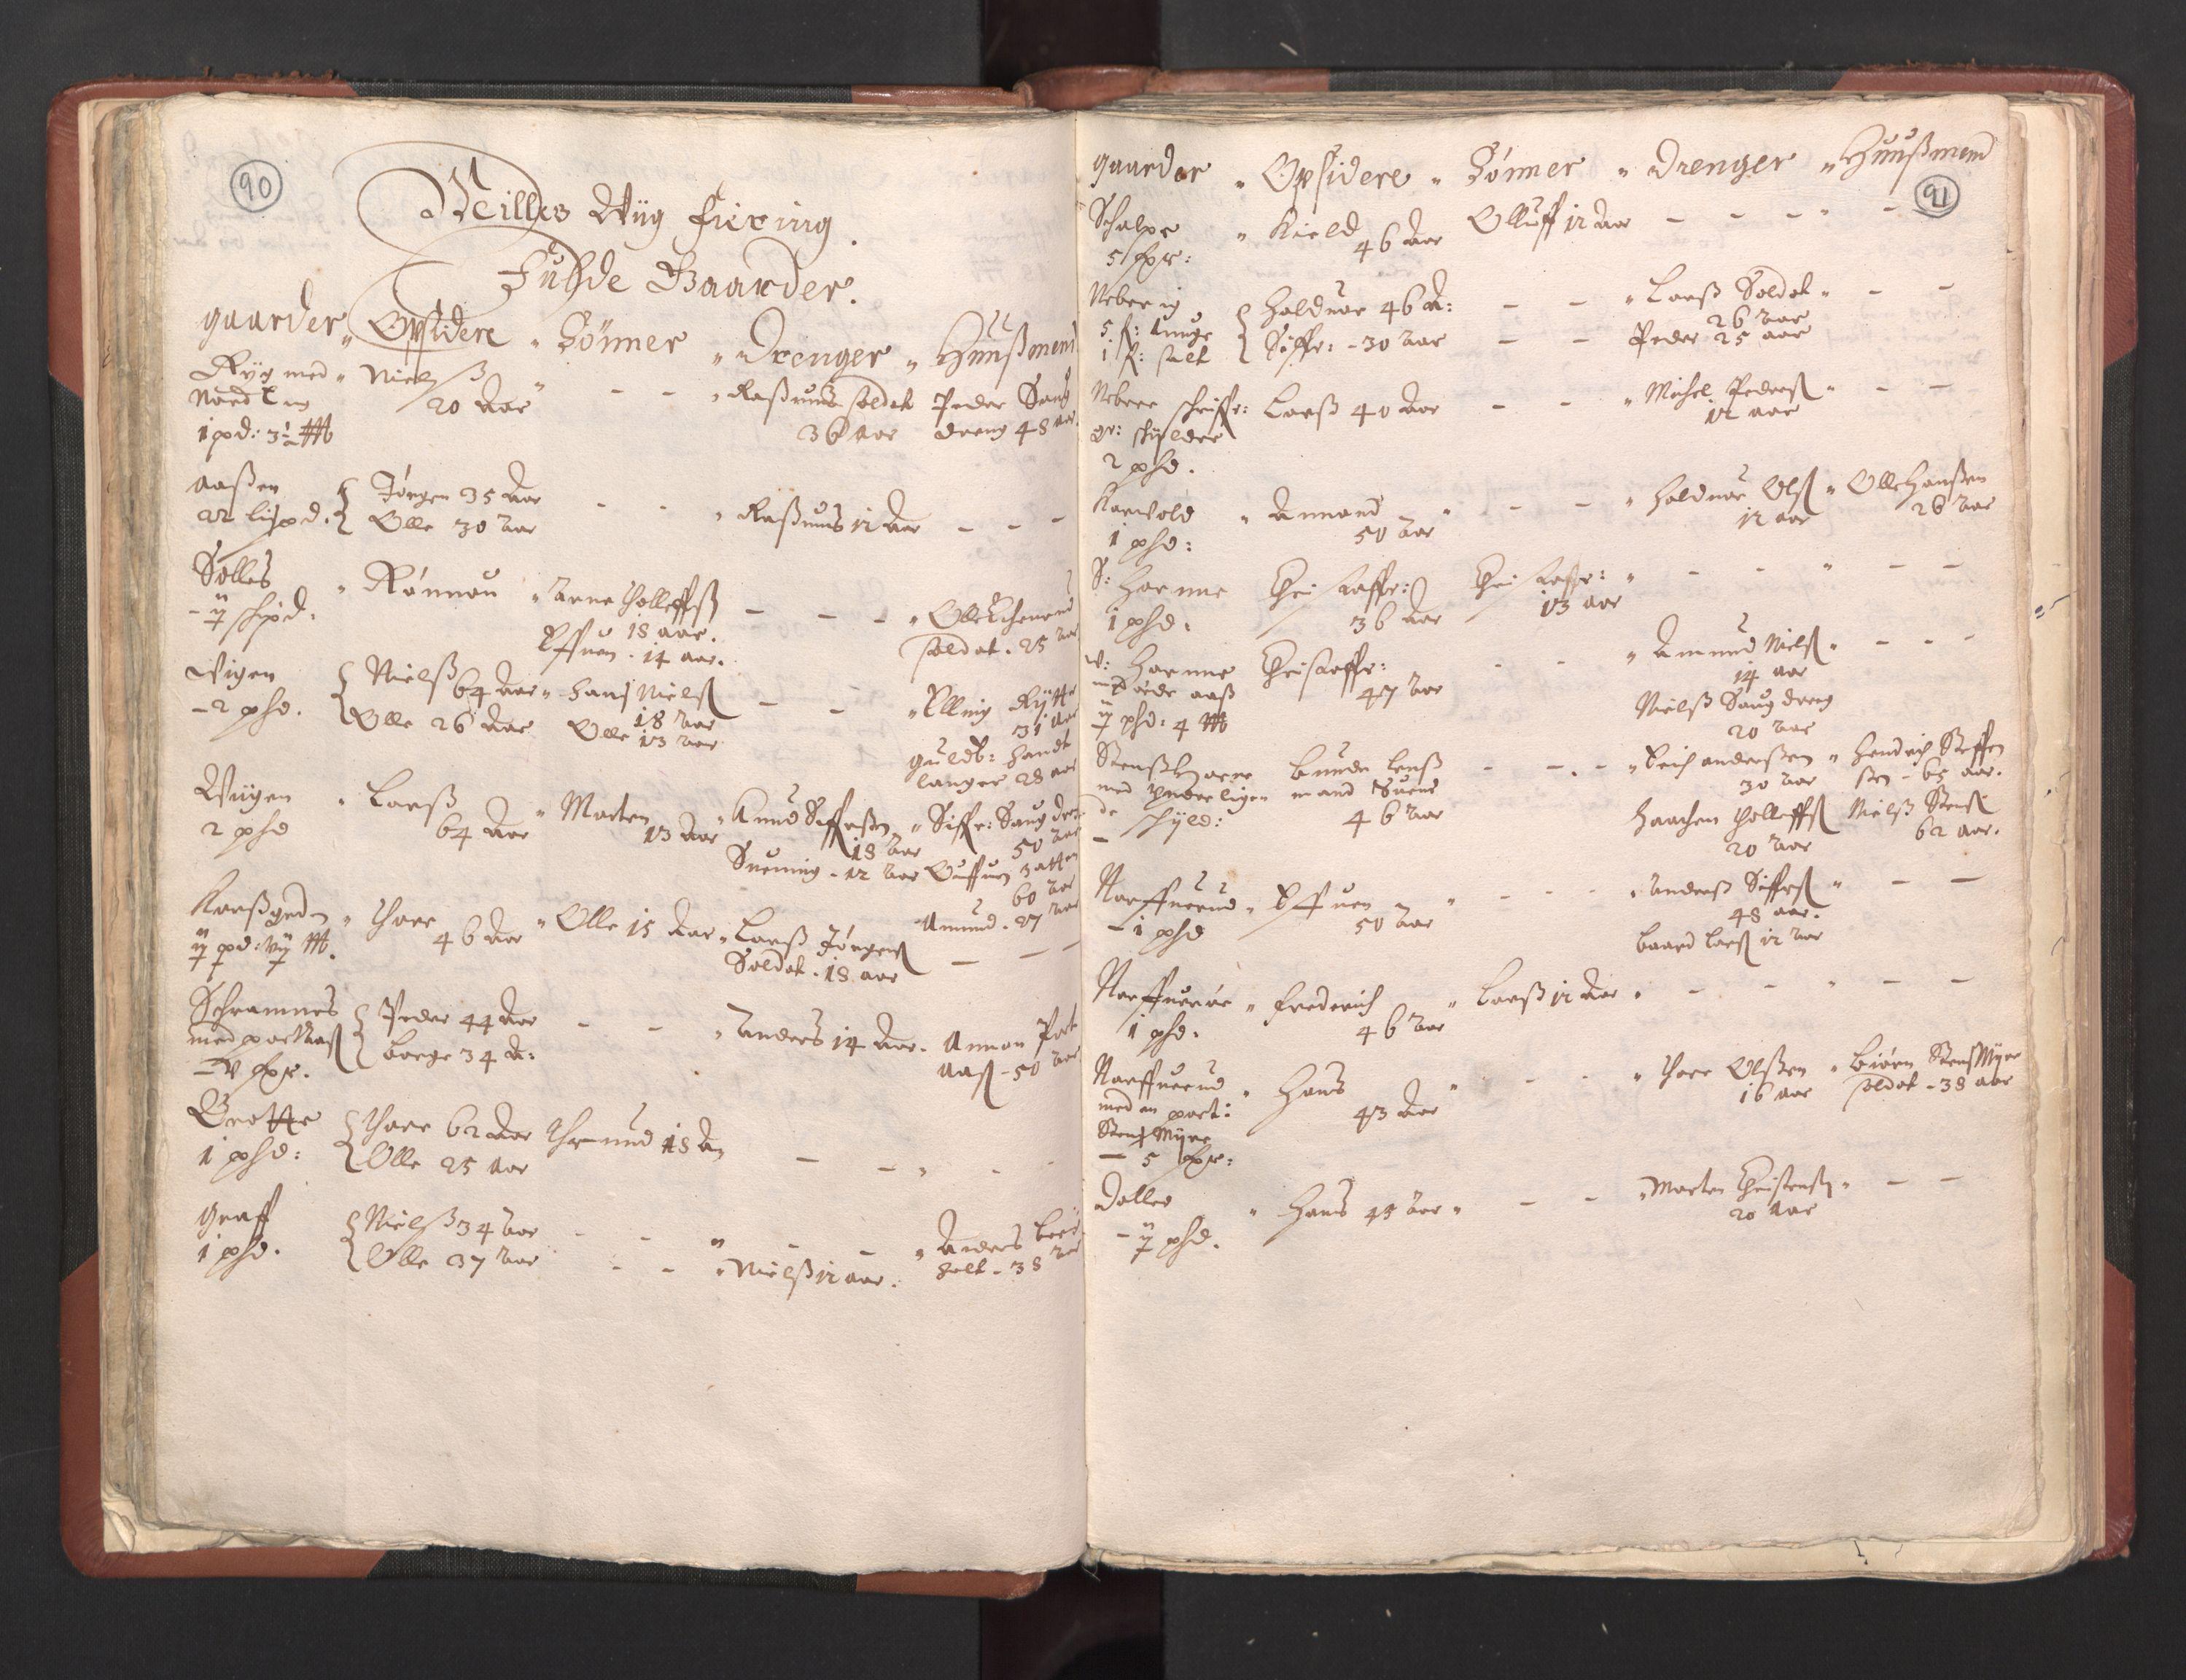 RA, Fogdenes og sorenskrivernes manntall 1664-1666, nr. 5: Fogderier (len og skipreider) i nåværende Buskerud fylke og Vestfold fylke, 1664, s. 90-91